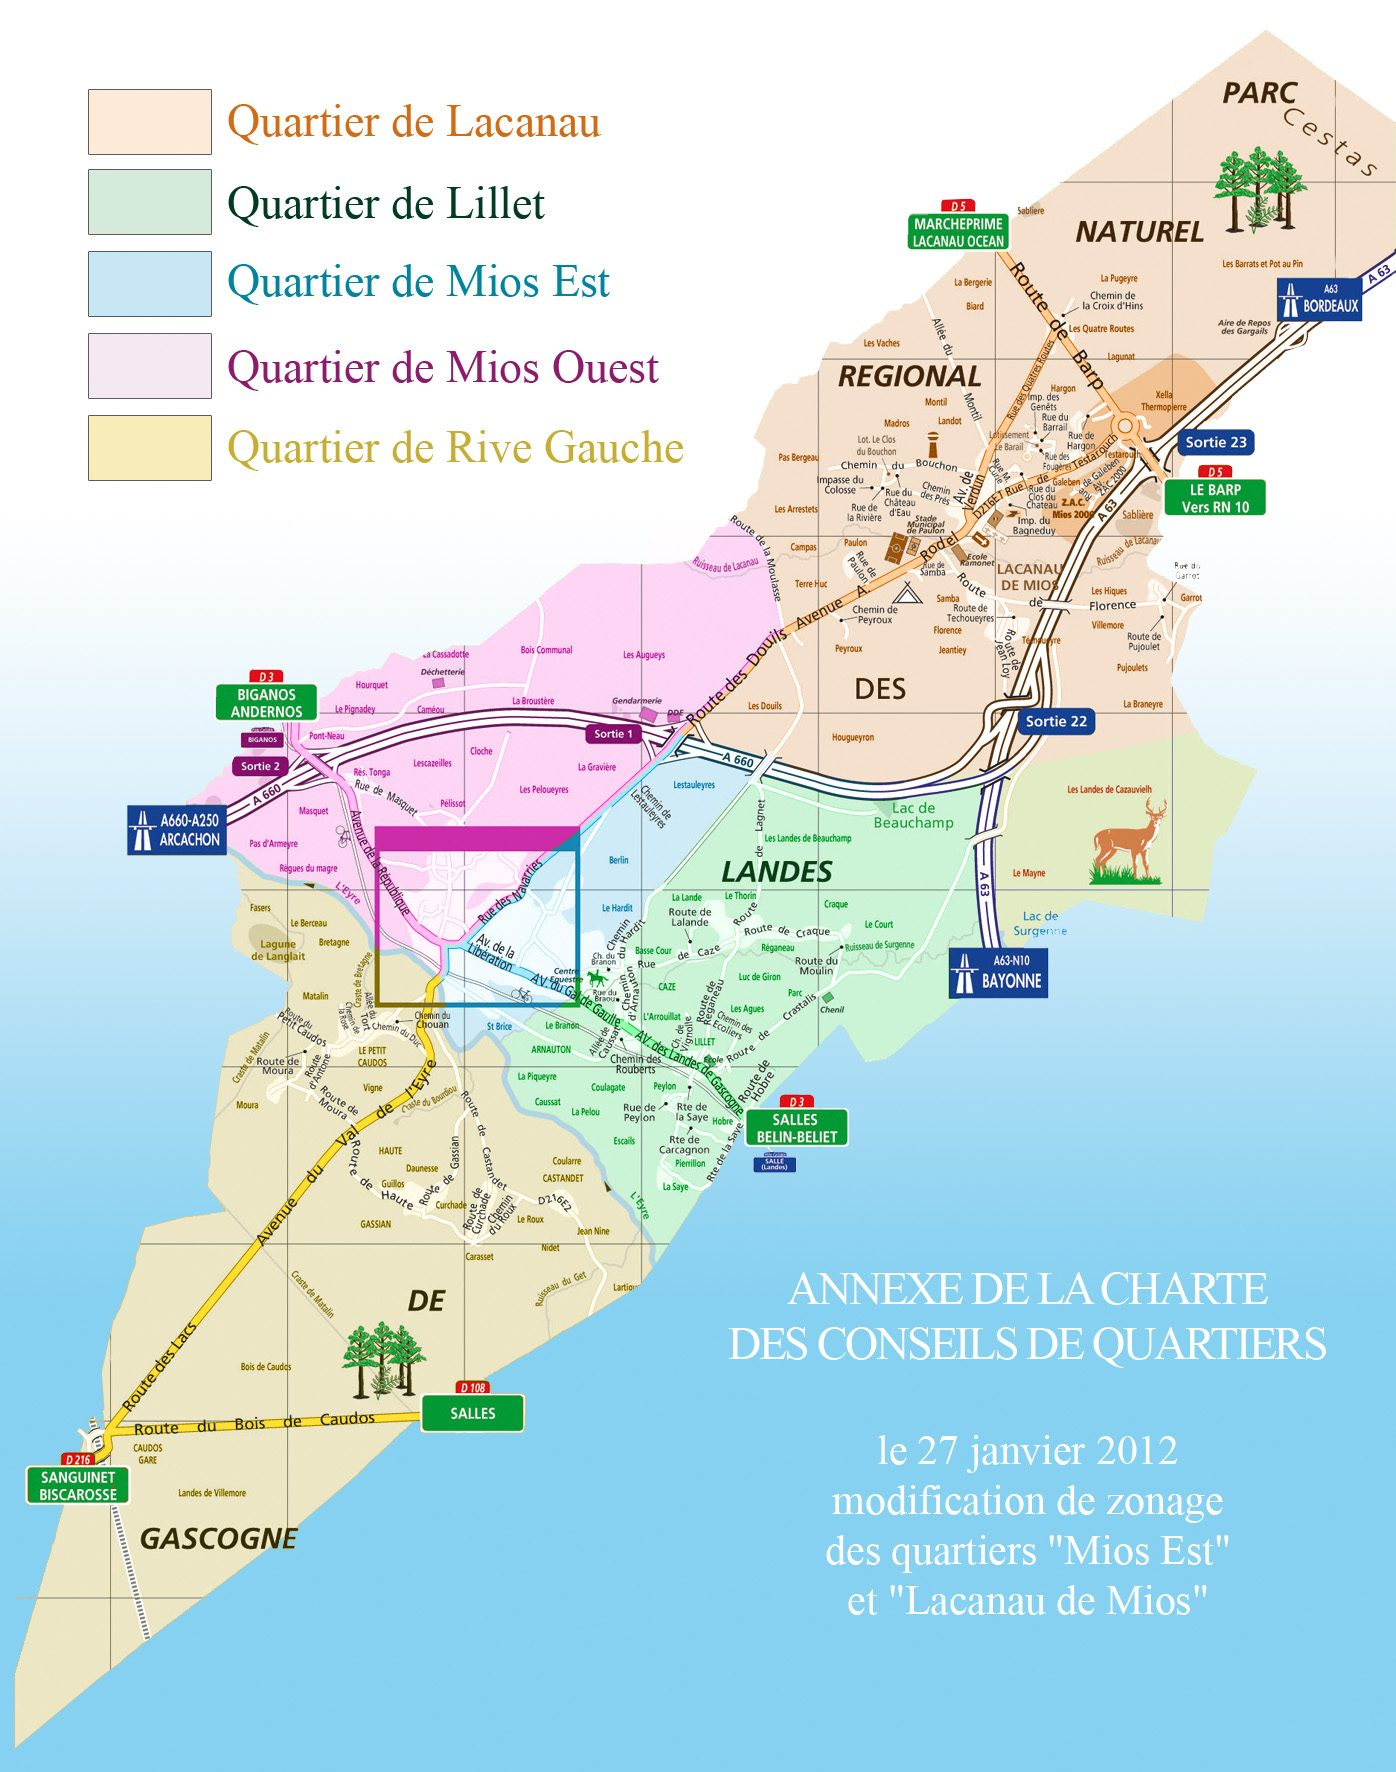 Plan Lacanau De Mios index of /wp-content/uploads/2012/03